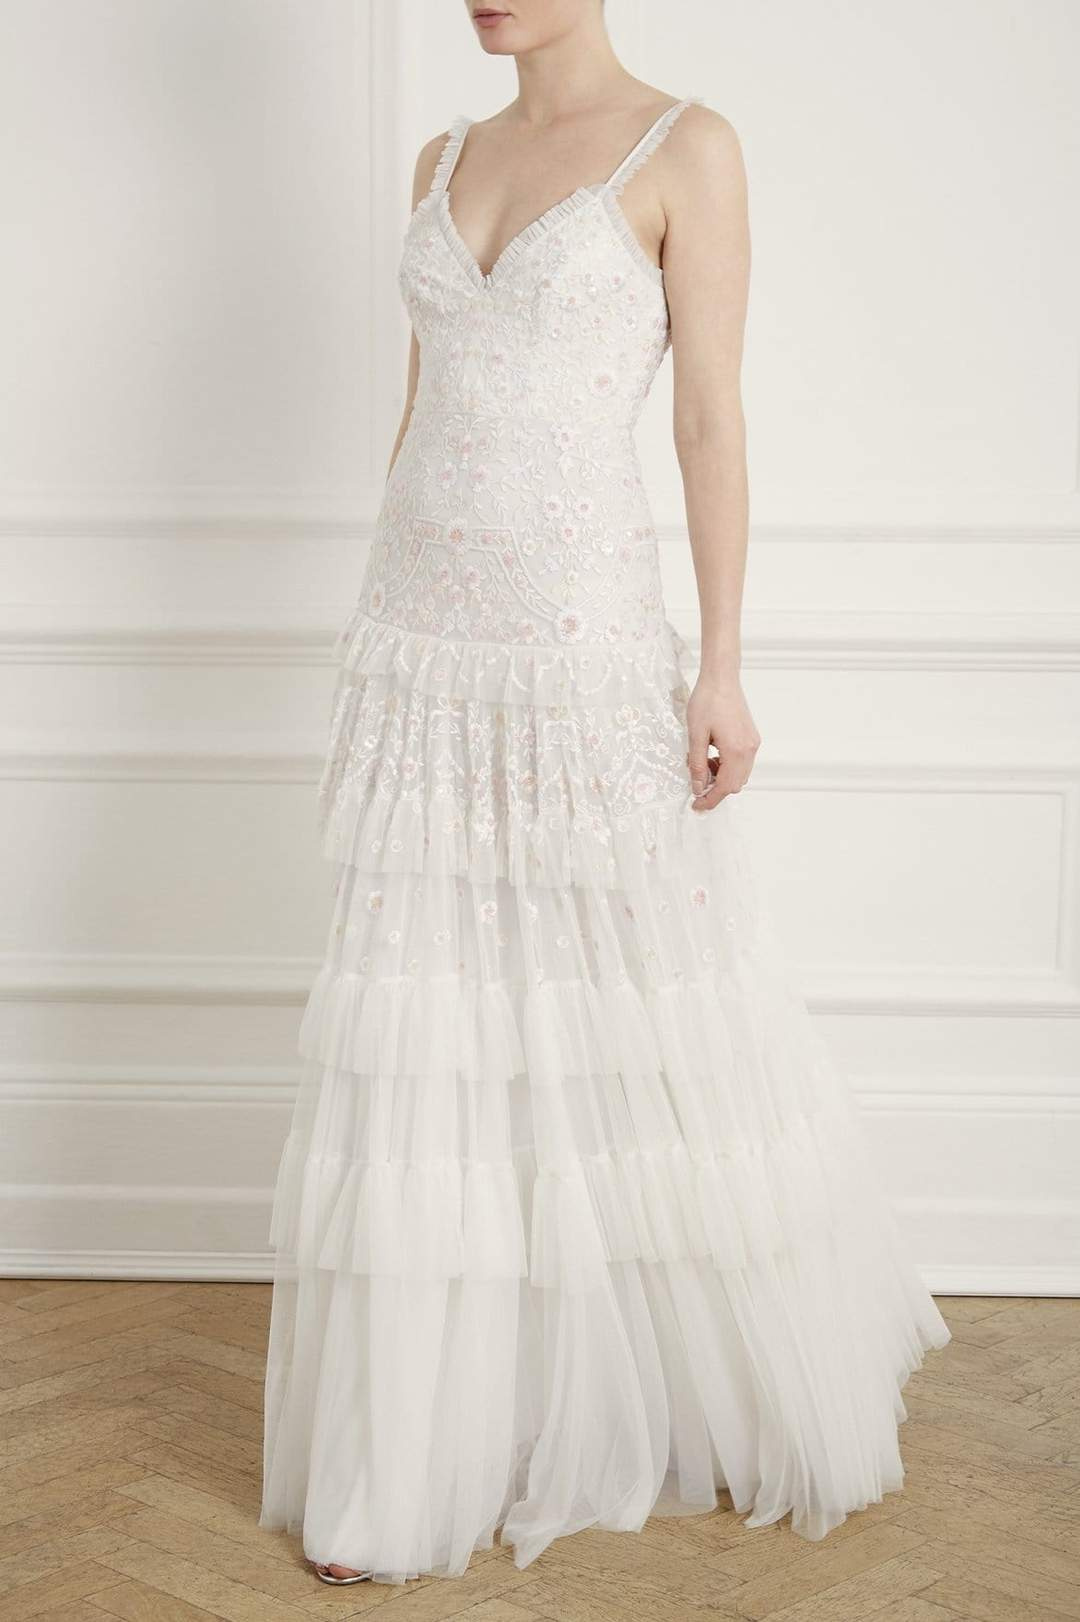 Needle and thread wedding dress